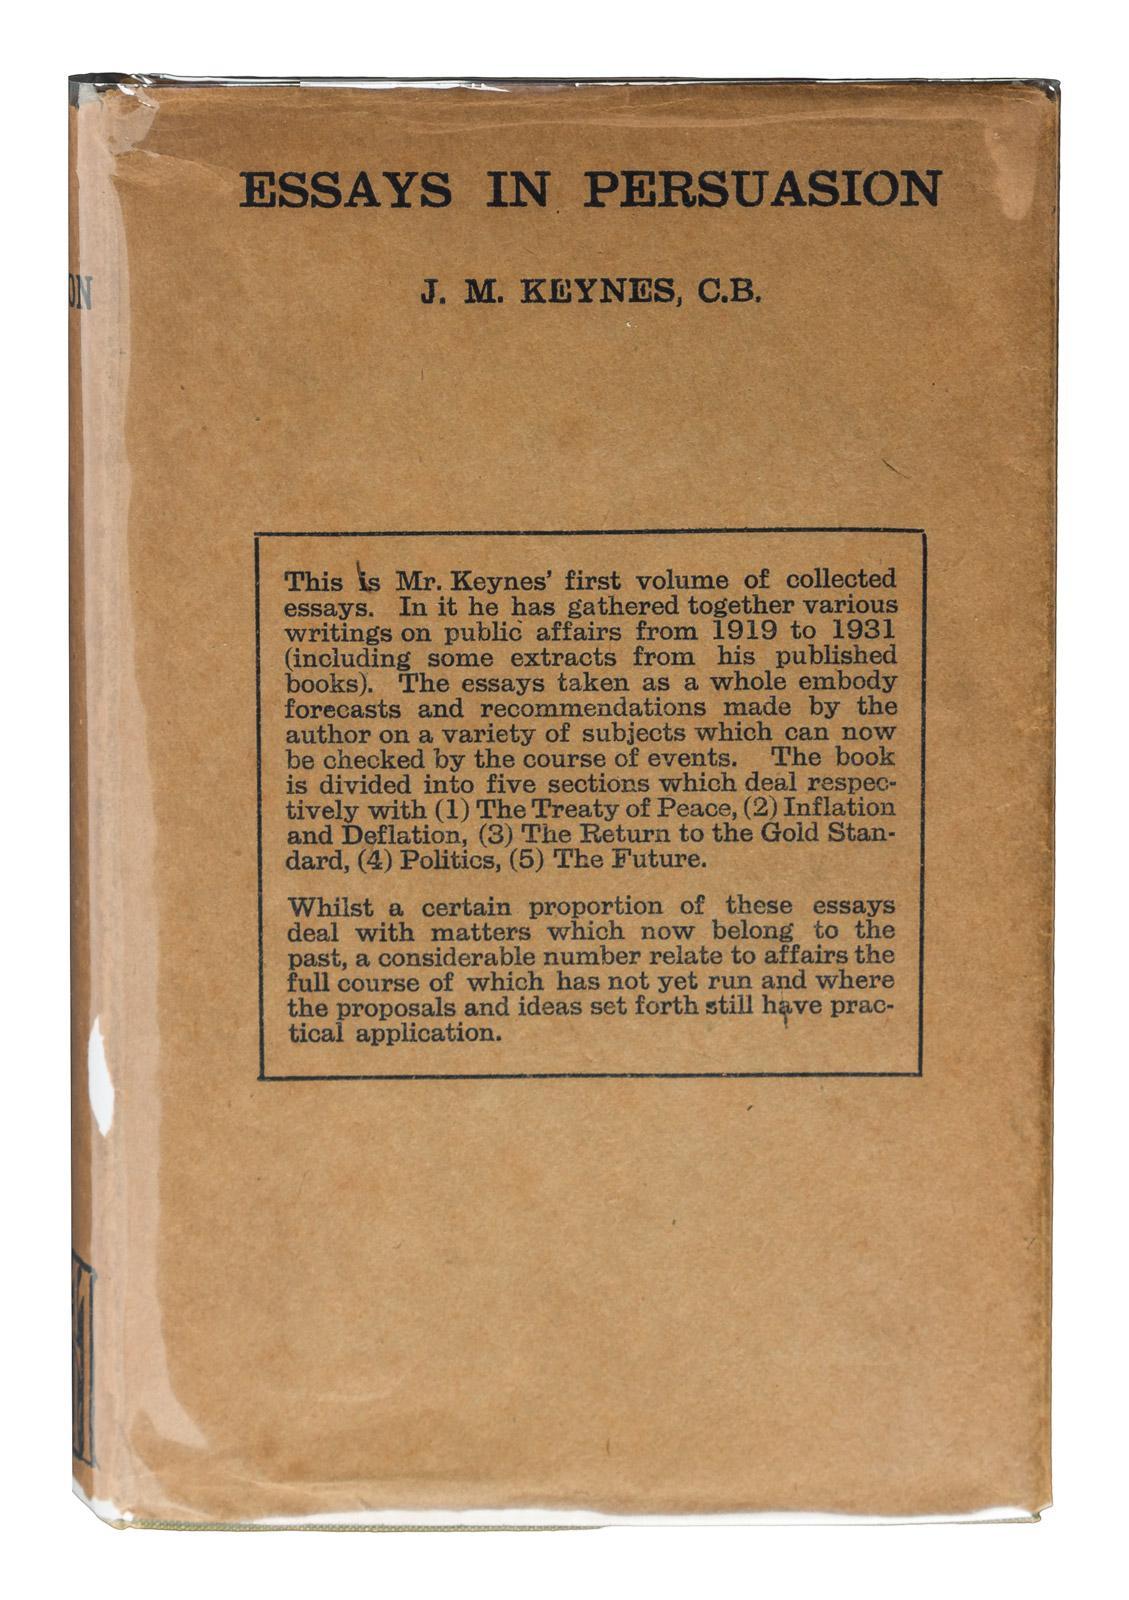 015 237551 0 Essay Example Essays In Remarkable Persuasion Audiobook Pdf John Maynard Keynes Summary Full